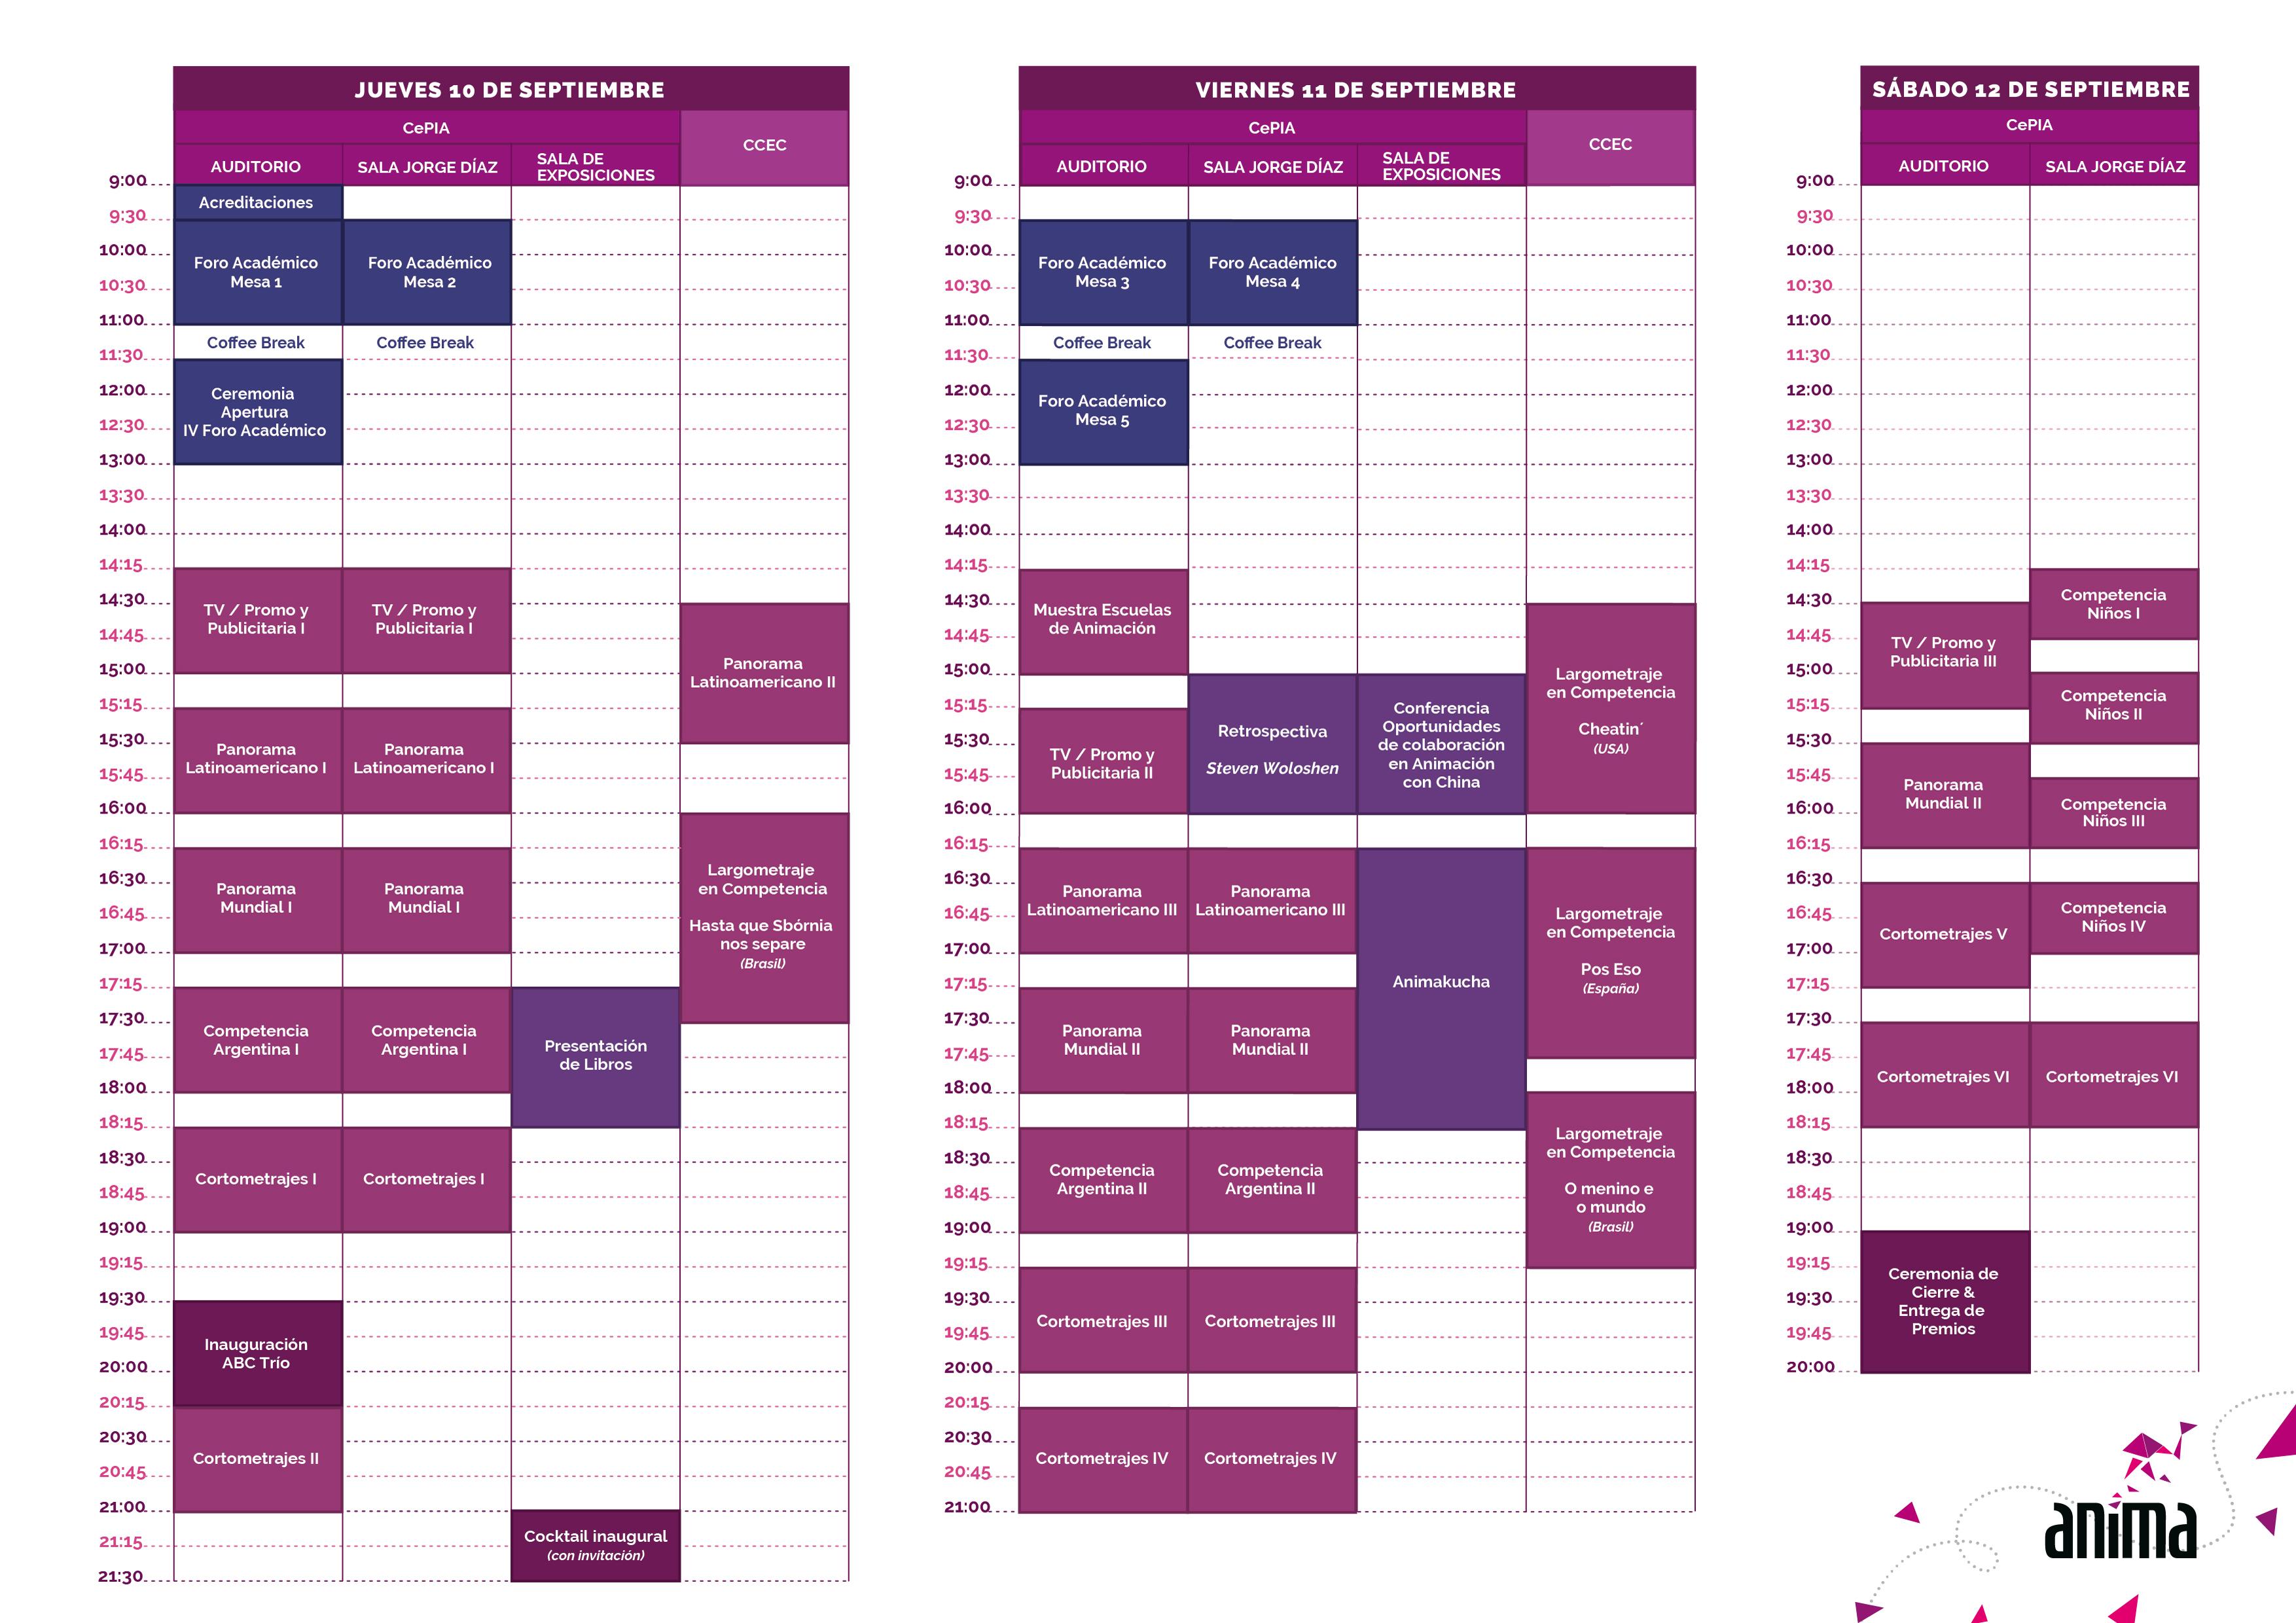 ANIMA2015 Schedule!